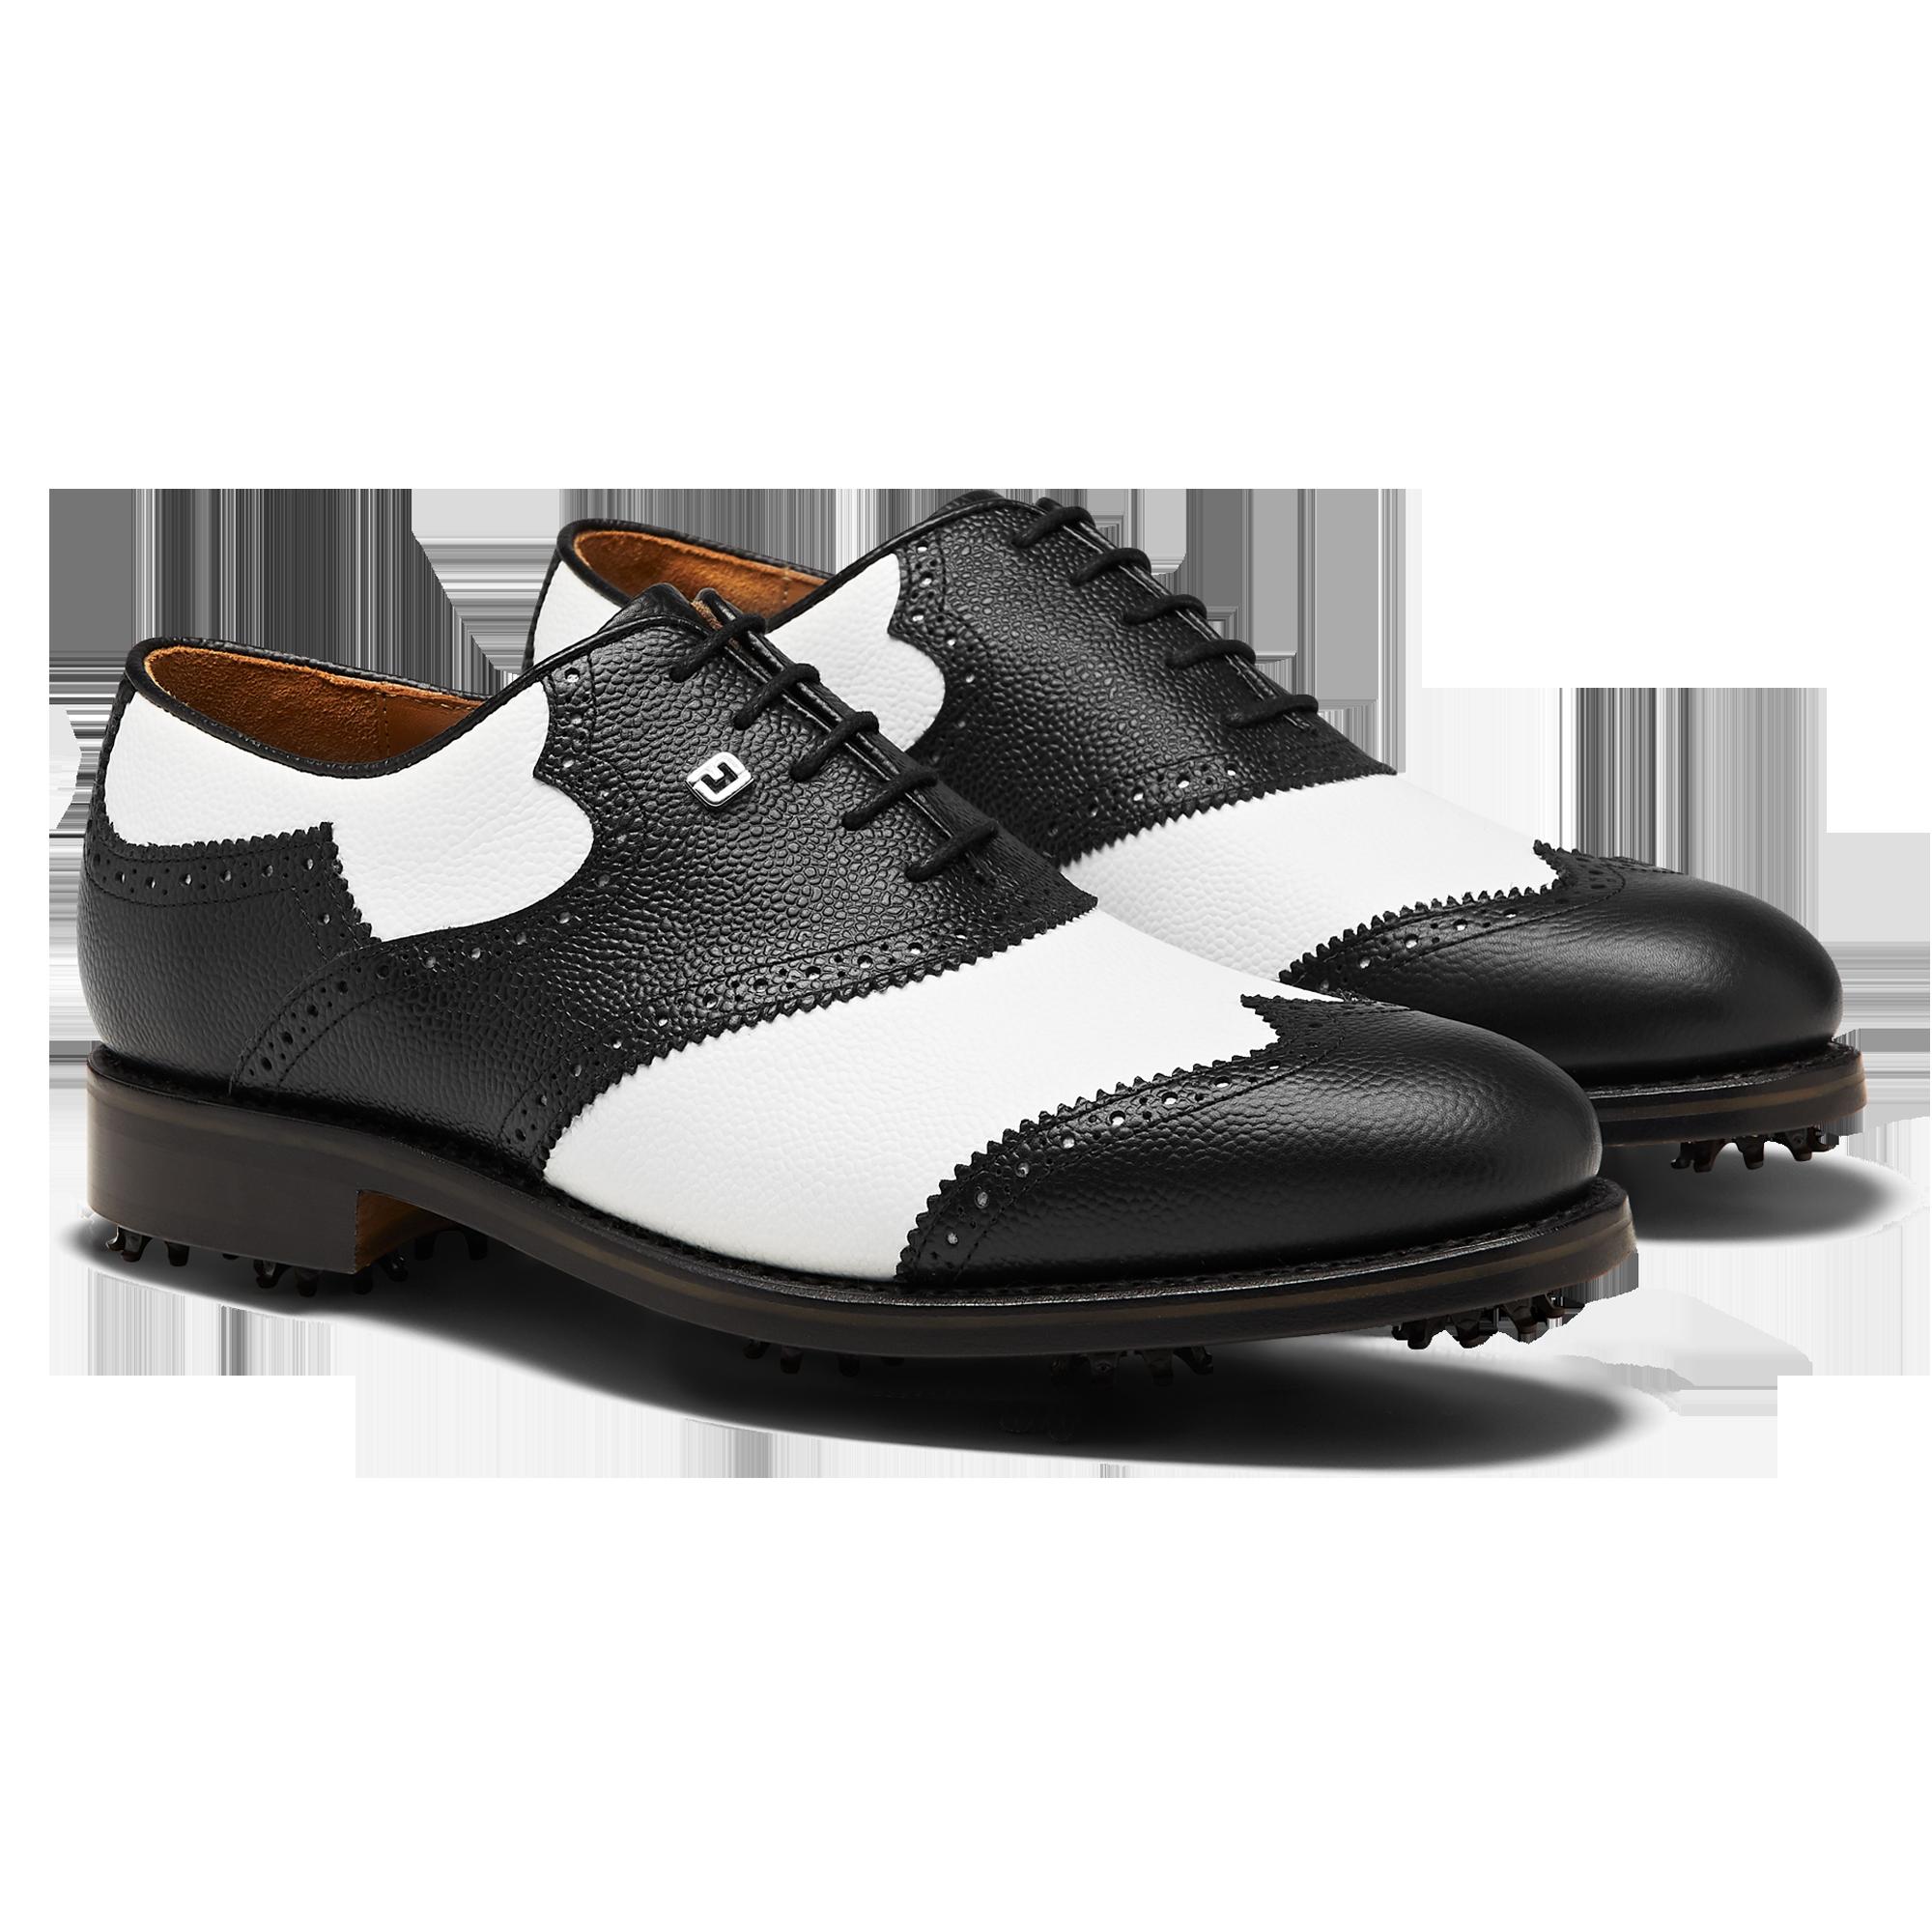 Modern, Handmade Golf Shoes | FJ 1857